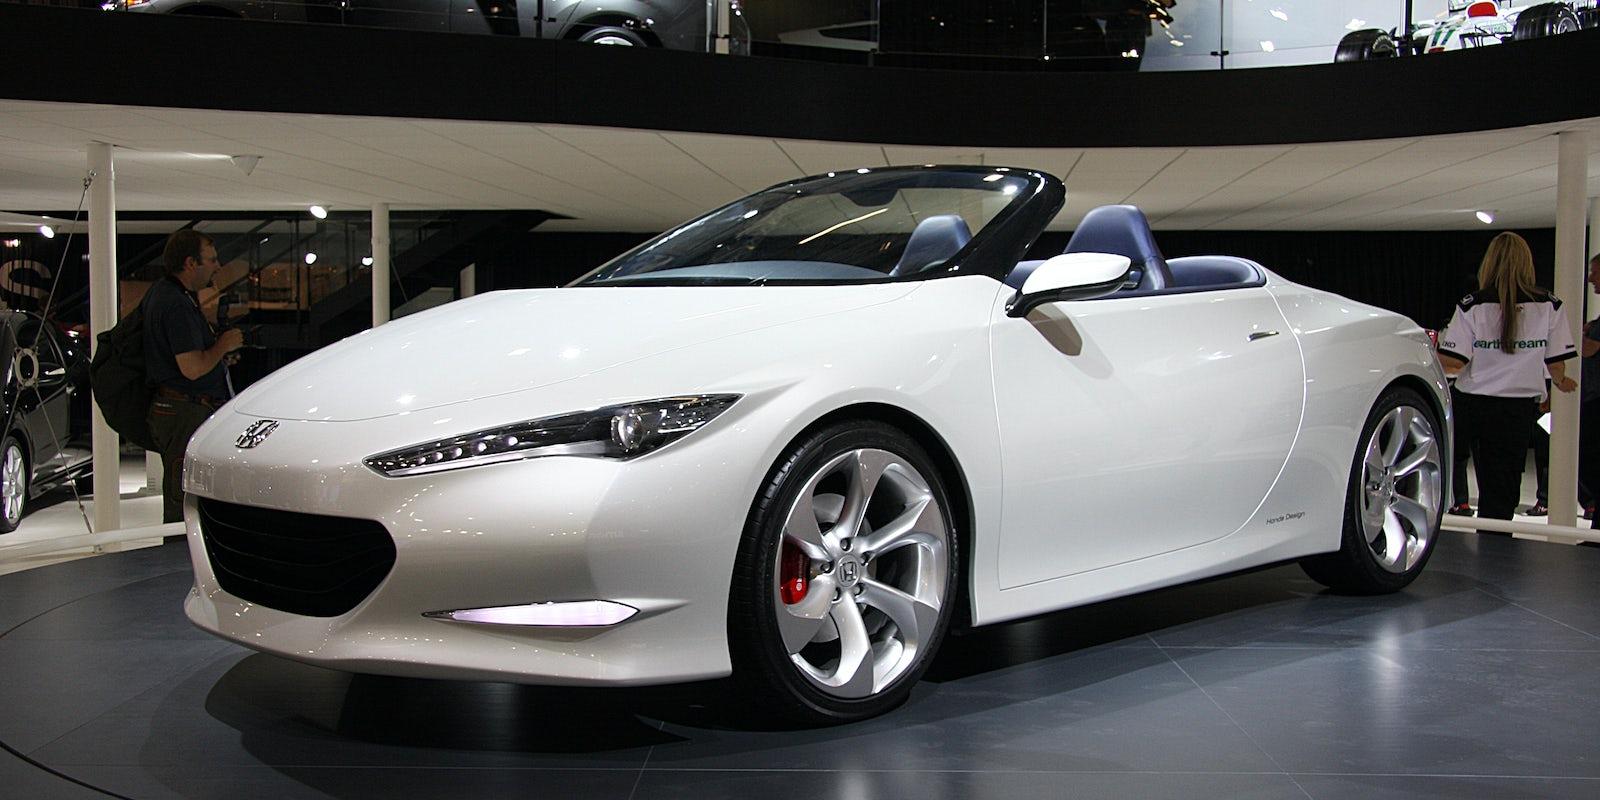 2020 Honda S2000 Rumors, Specs, Price, And Release Date >> New Honda S2000 Price Specs And Release Date Carwow